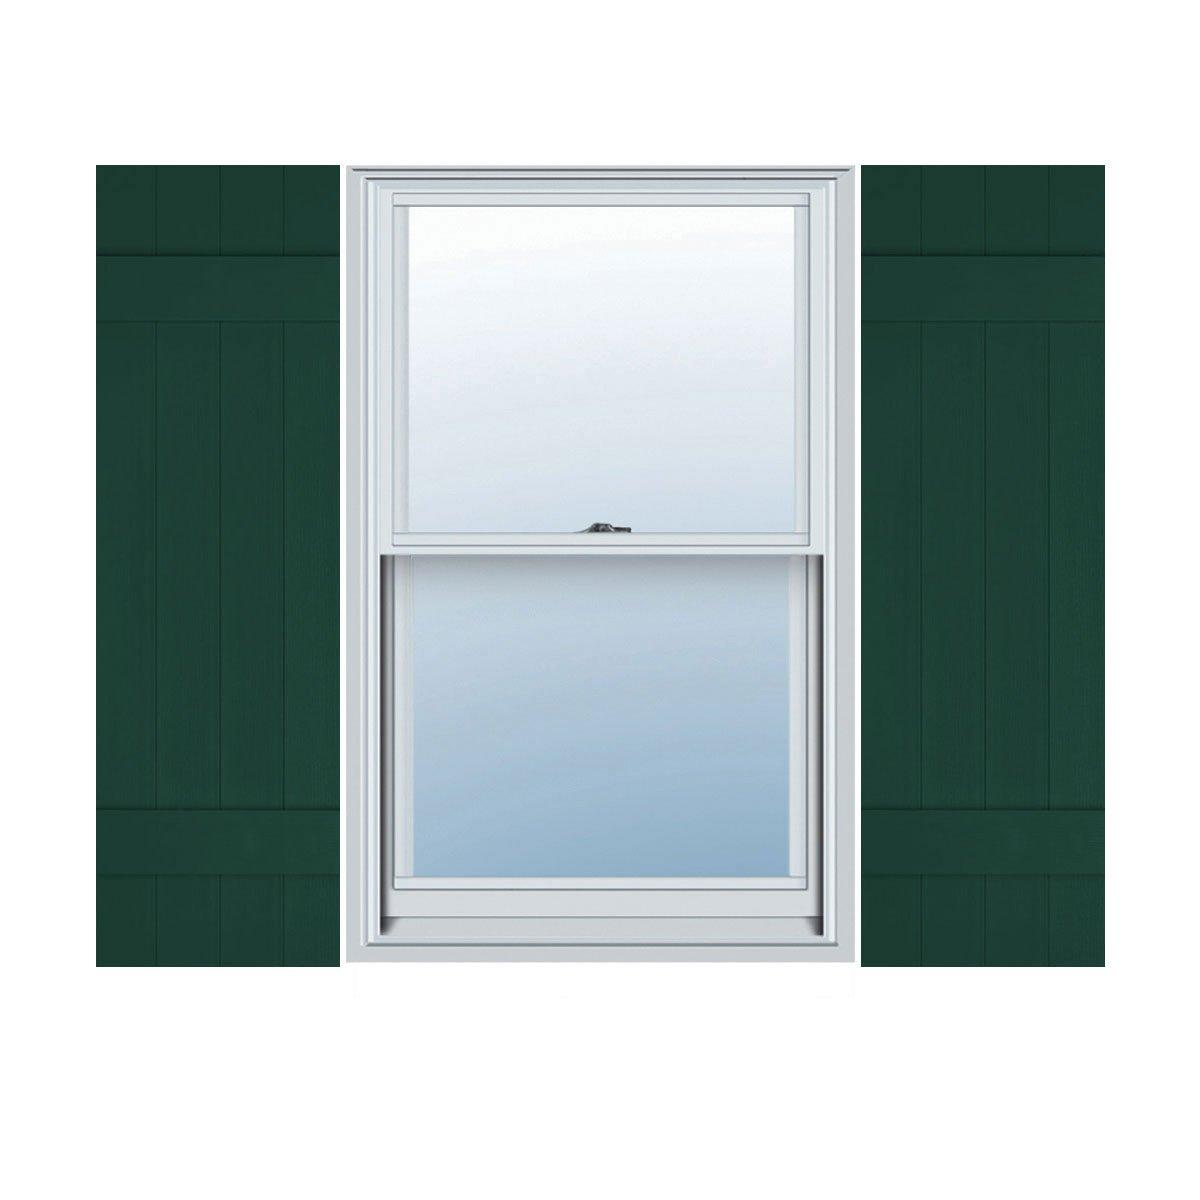 Midnight Green Per Pair Ekena Millwork LJ4S14X04700MG Lifetime Vinyl Standard Shutter 14W x 47H